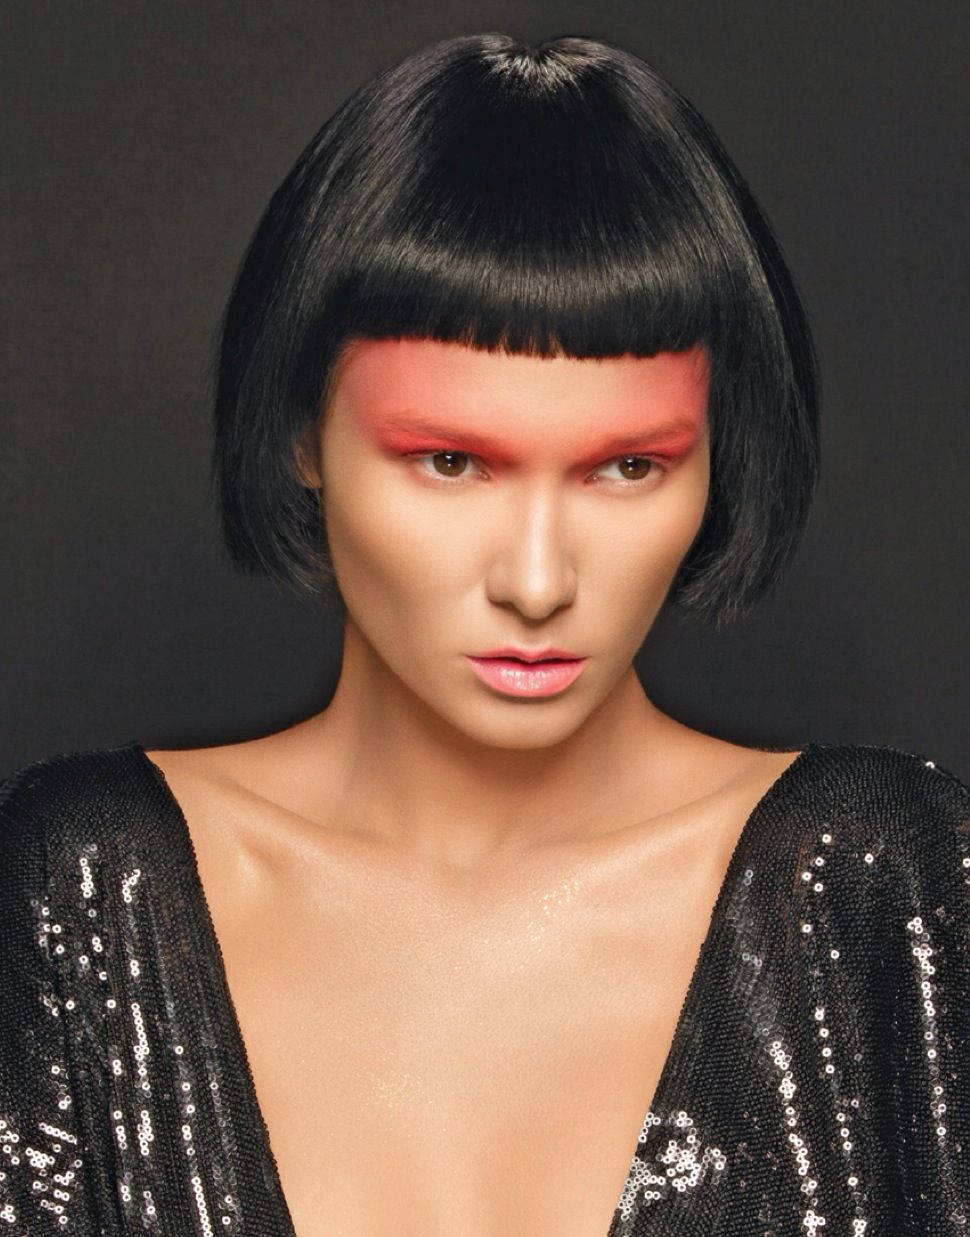 Scott Barnes makeup Makeup Pinterest